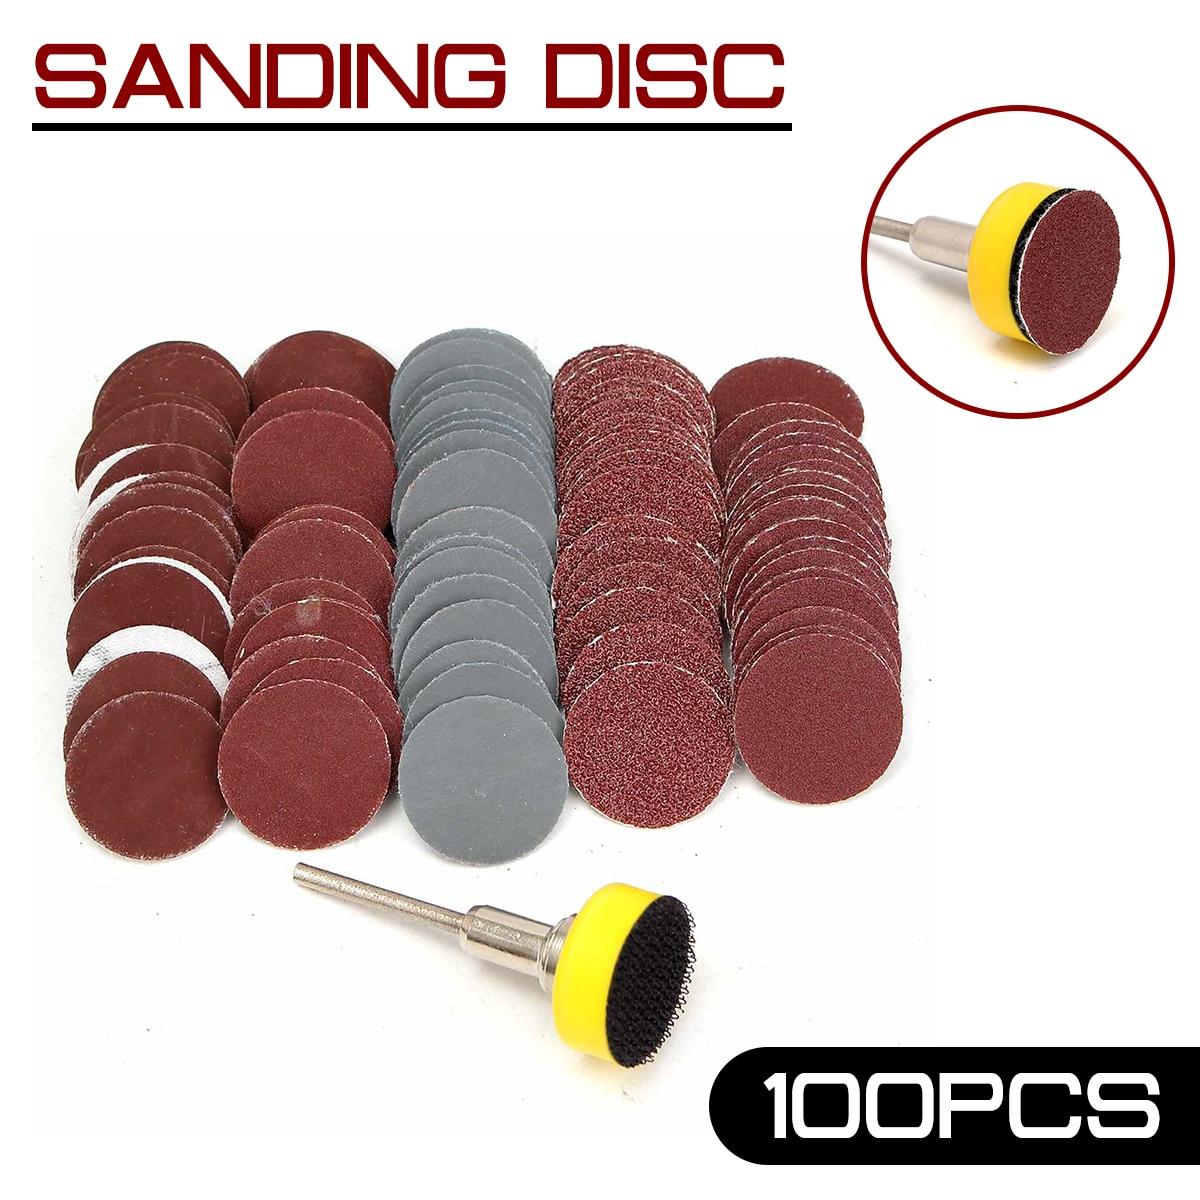 1inch 100Pcs Sanding Disc + Loop Sanding Pad 1inch +1/8inch Shank Abrasives Hook Loop Backer SandPaper Mixed Set